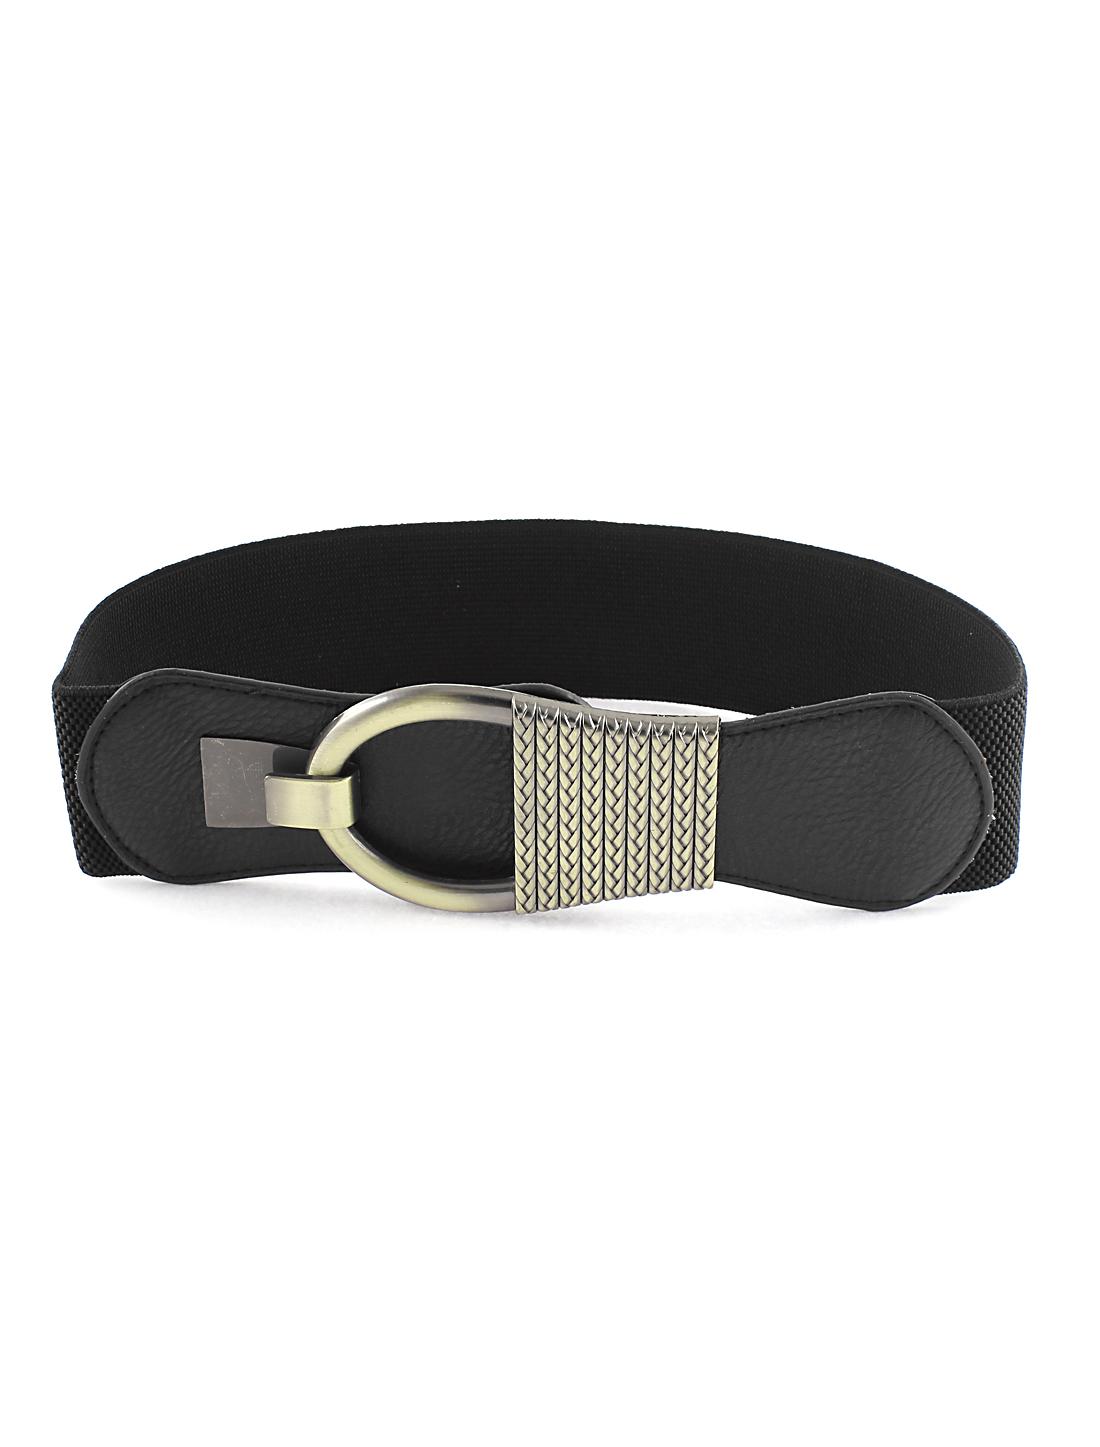 Black Bronze Tone Interlocking Buckle Waist Belt for Lady